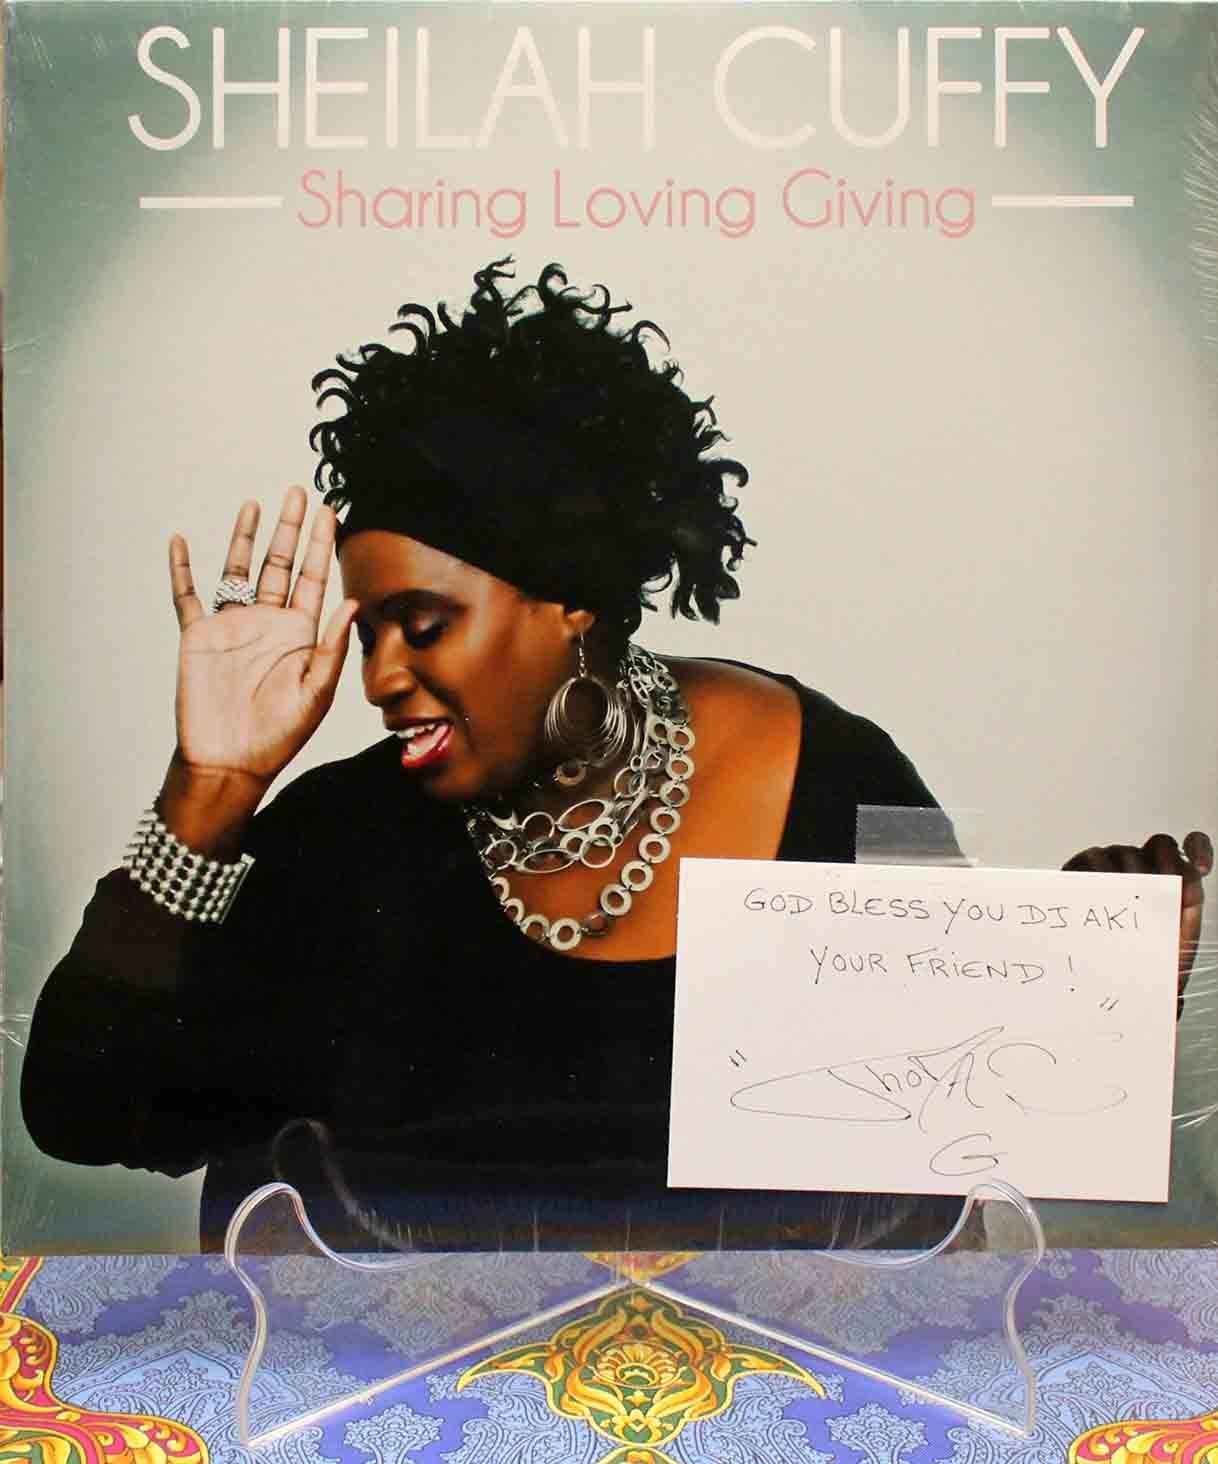 Thomas G Sheilah Cuffy – Sharing Loving Giving 01